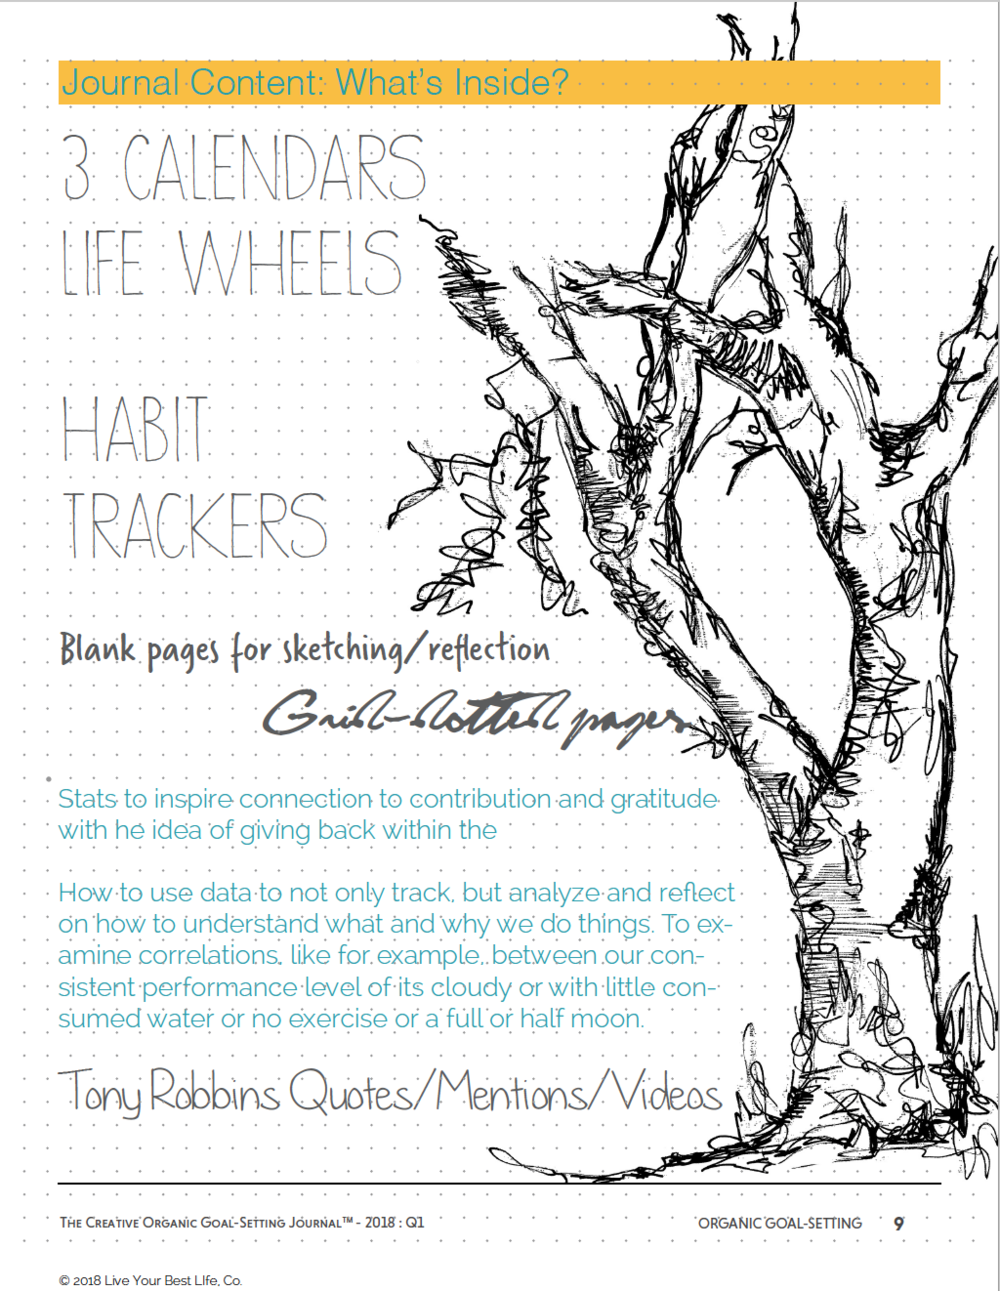 creative organic goal setting journal tony robbins new years resolutions.png